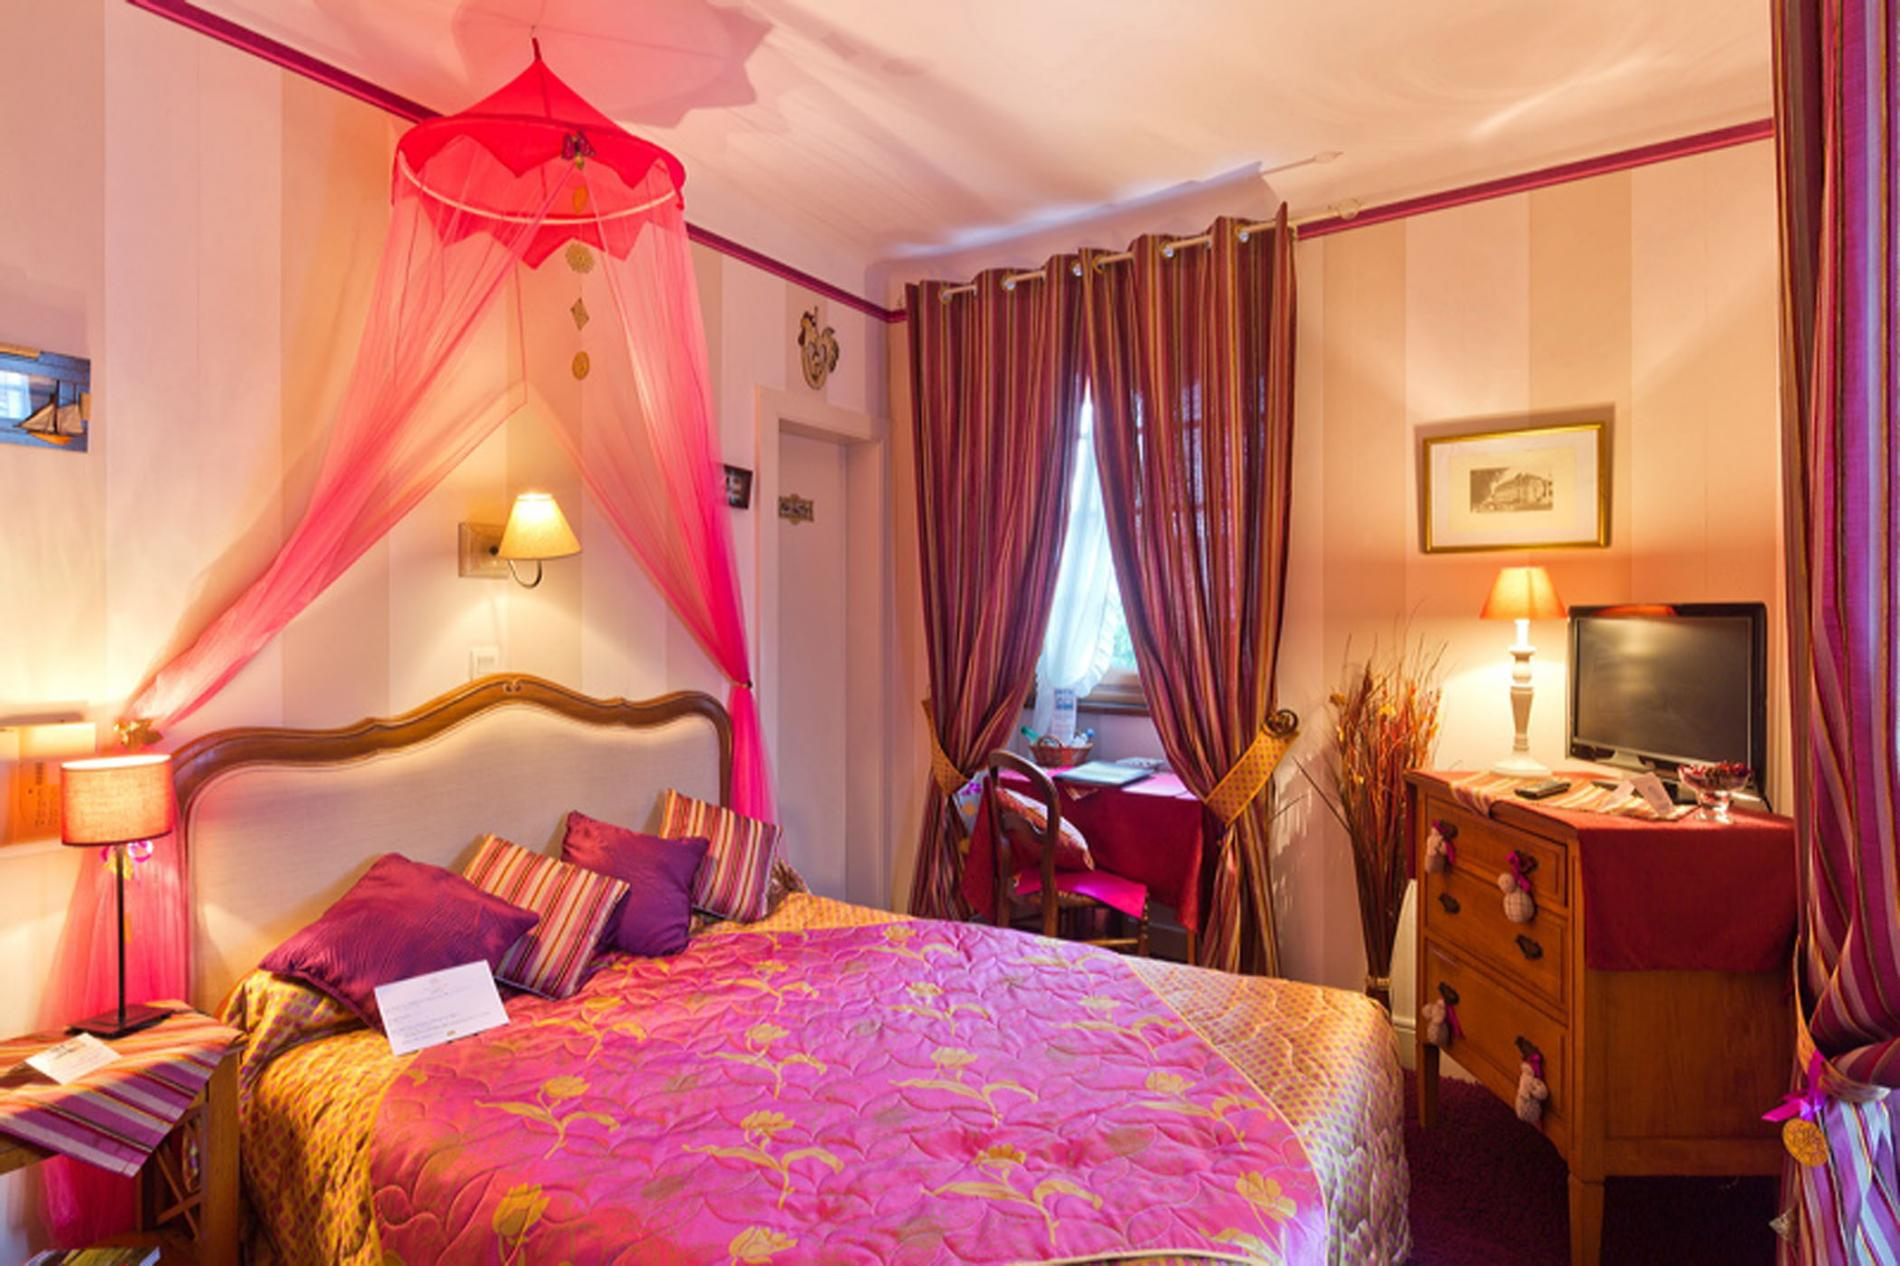 Chambres Hotel EVIAN Bord Lac Leman Hotel Les Cygnes ***